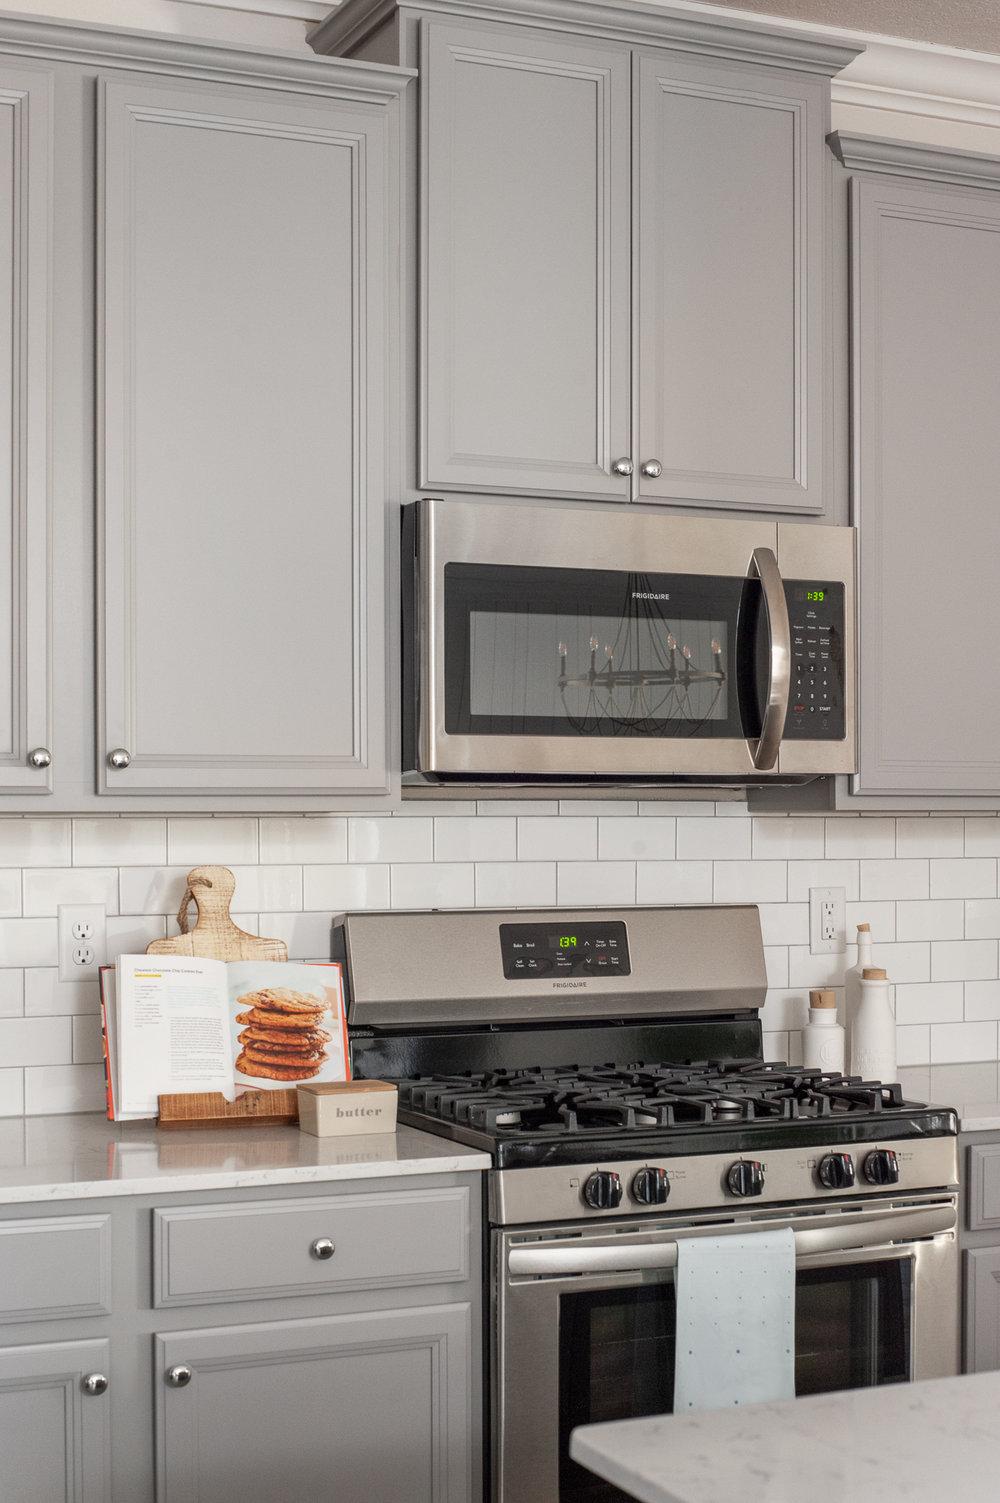 Micamy_Interior Designer_Design_Interior_Model_Merchandising_Kitchen_Grey_Cabinets_Forty West_Lennar_Place Setting_SubwayTile_Farmhouse_Gas Oven.jpg